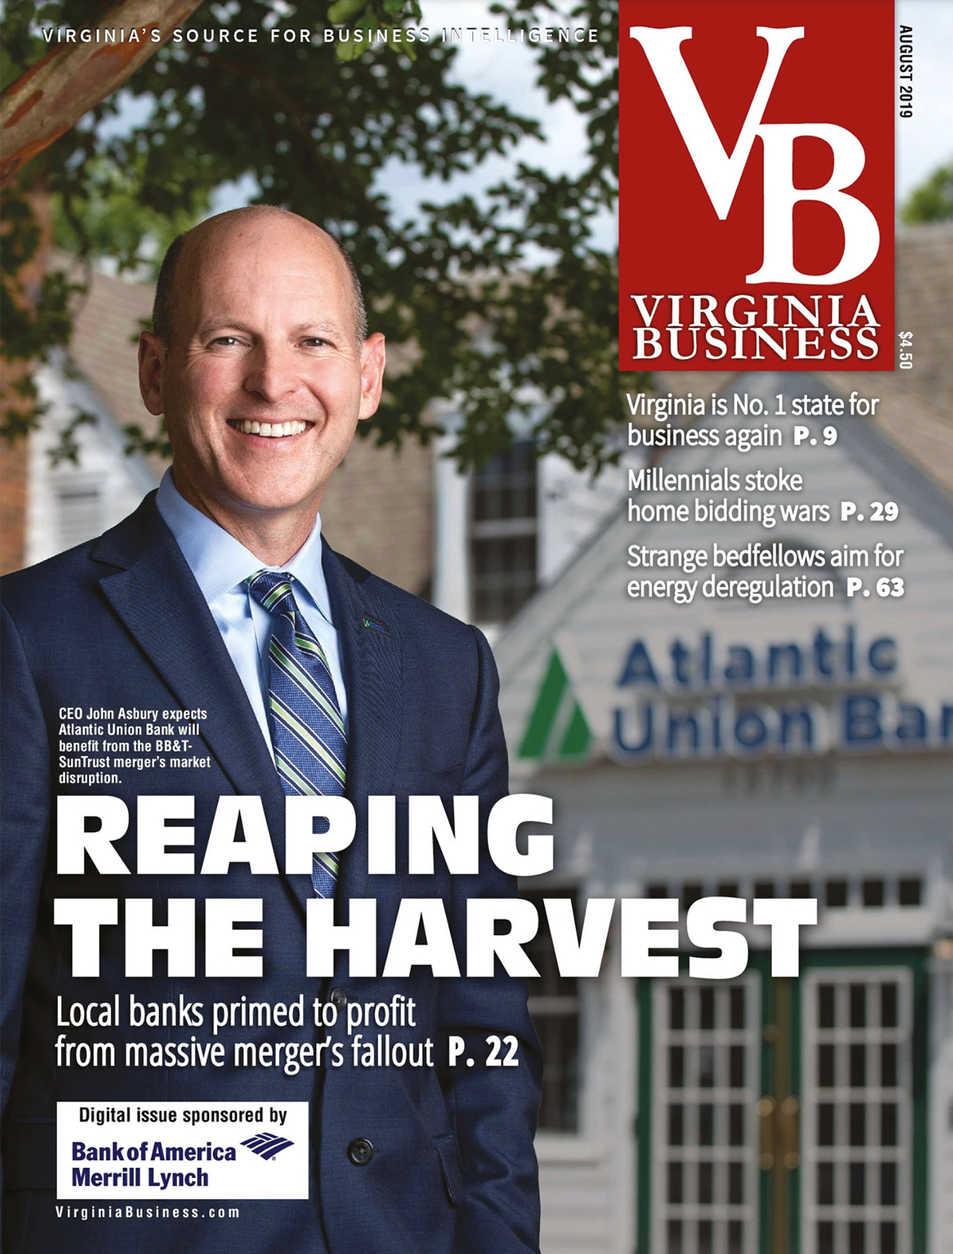 Virginia-Business-Magazine-Tearsheet2.jp